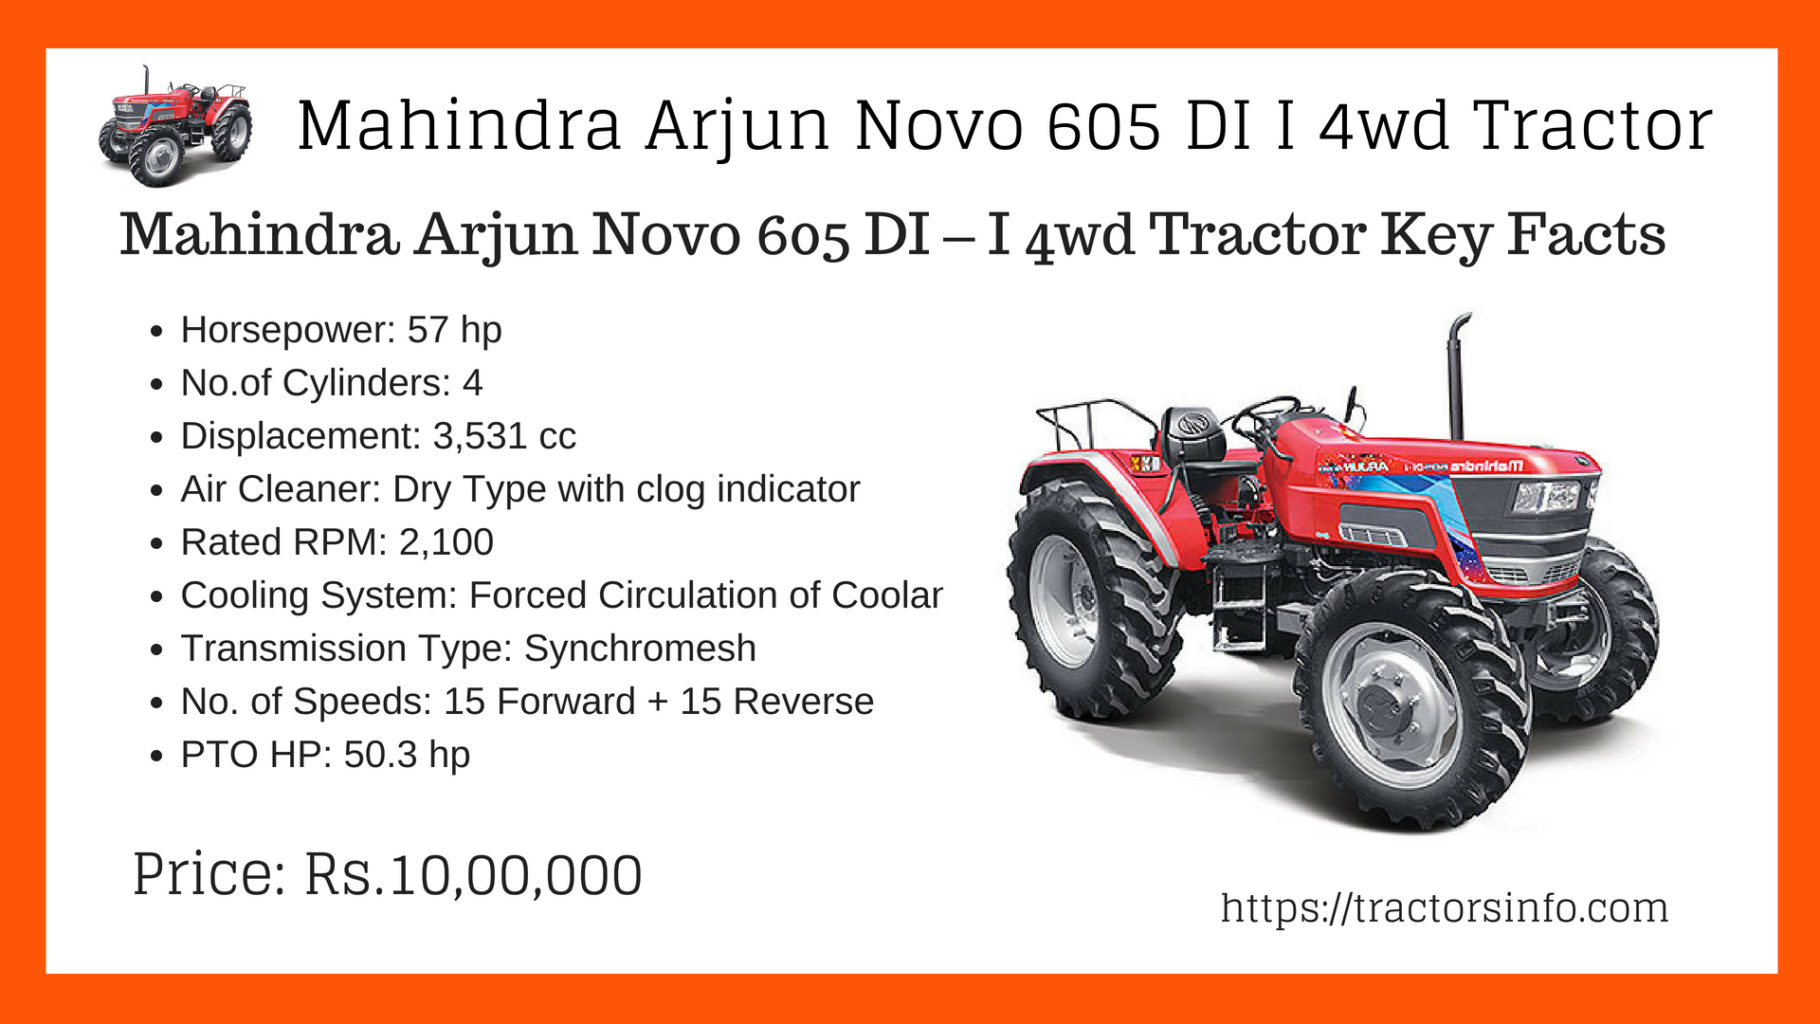 Mahindra Arjun Novo 605 DI – I 4wd Tractor